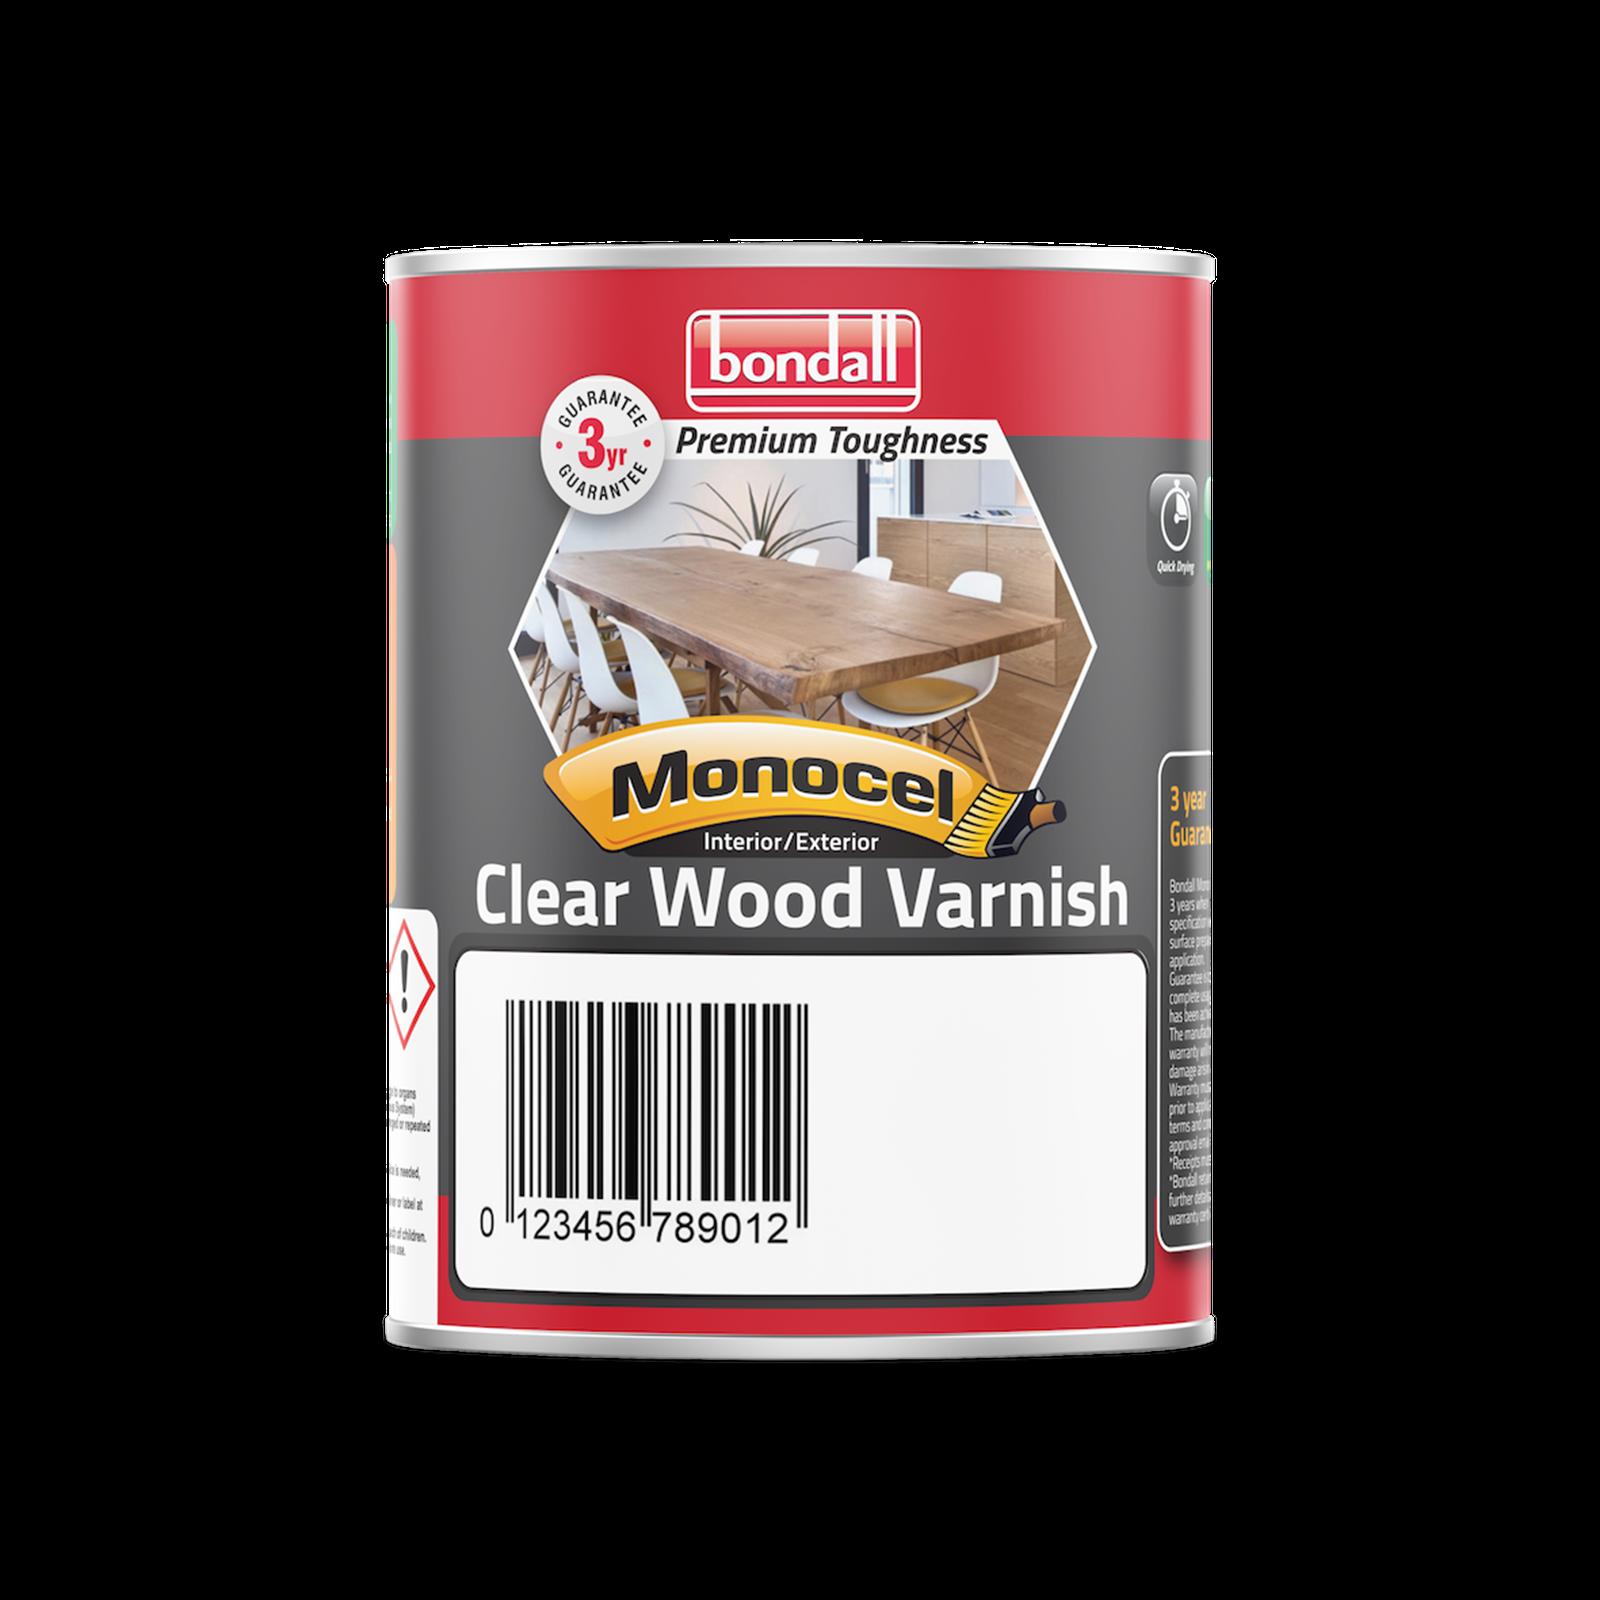 Bondall 250ml Ultra Gloss Monocel Clear Timber Varnish